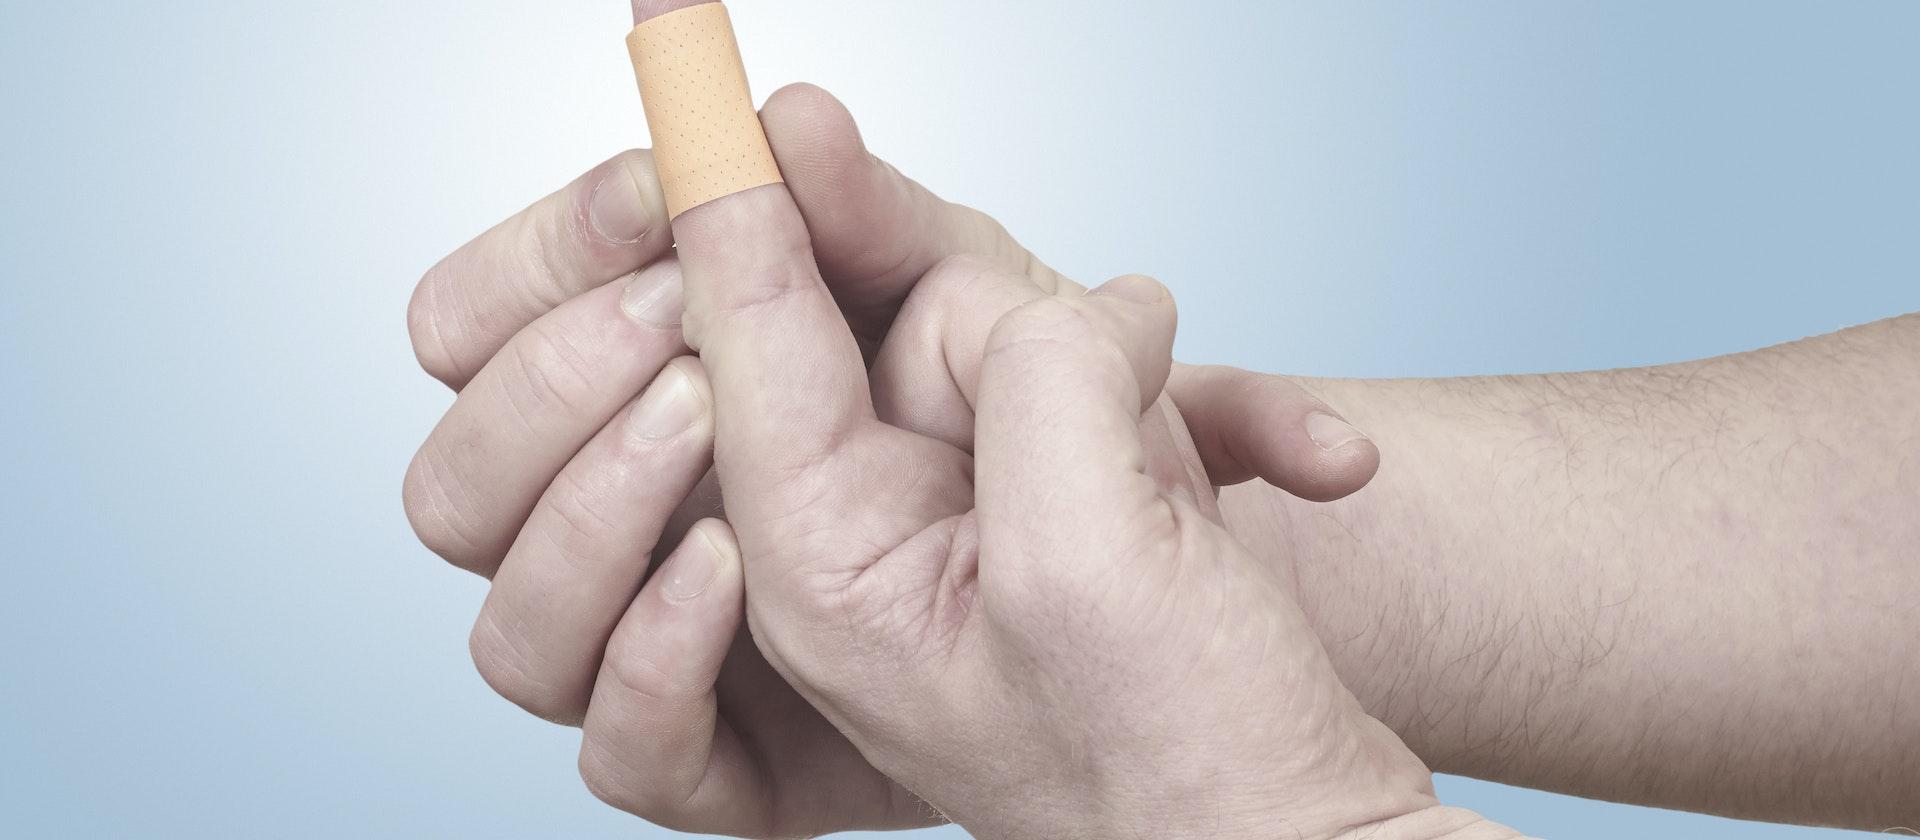 Finger Pain Symptoms, Causes & Treatment Options | Buoy